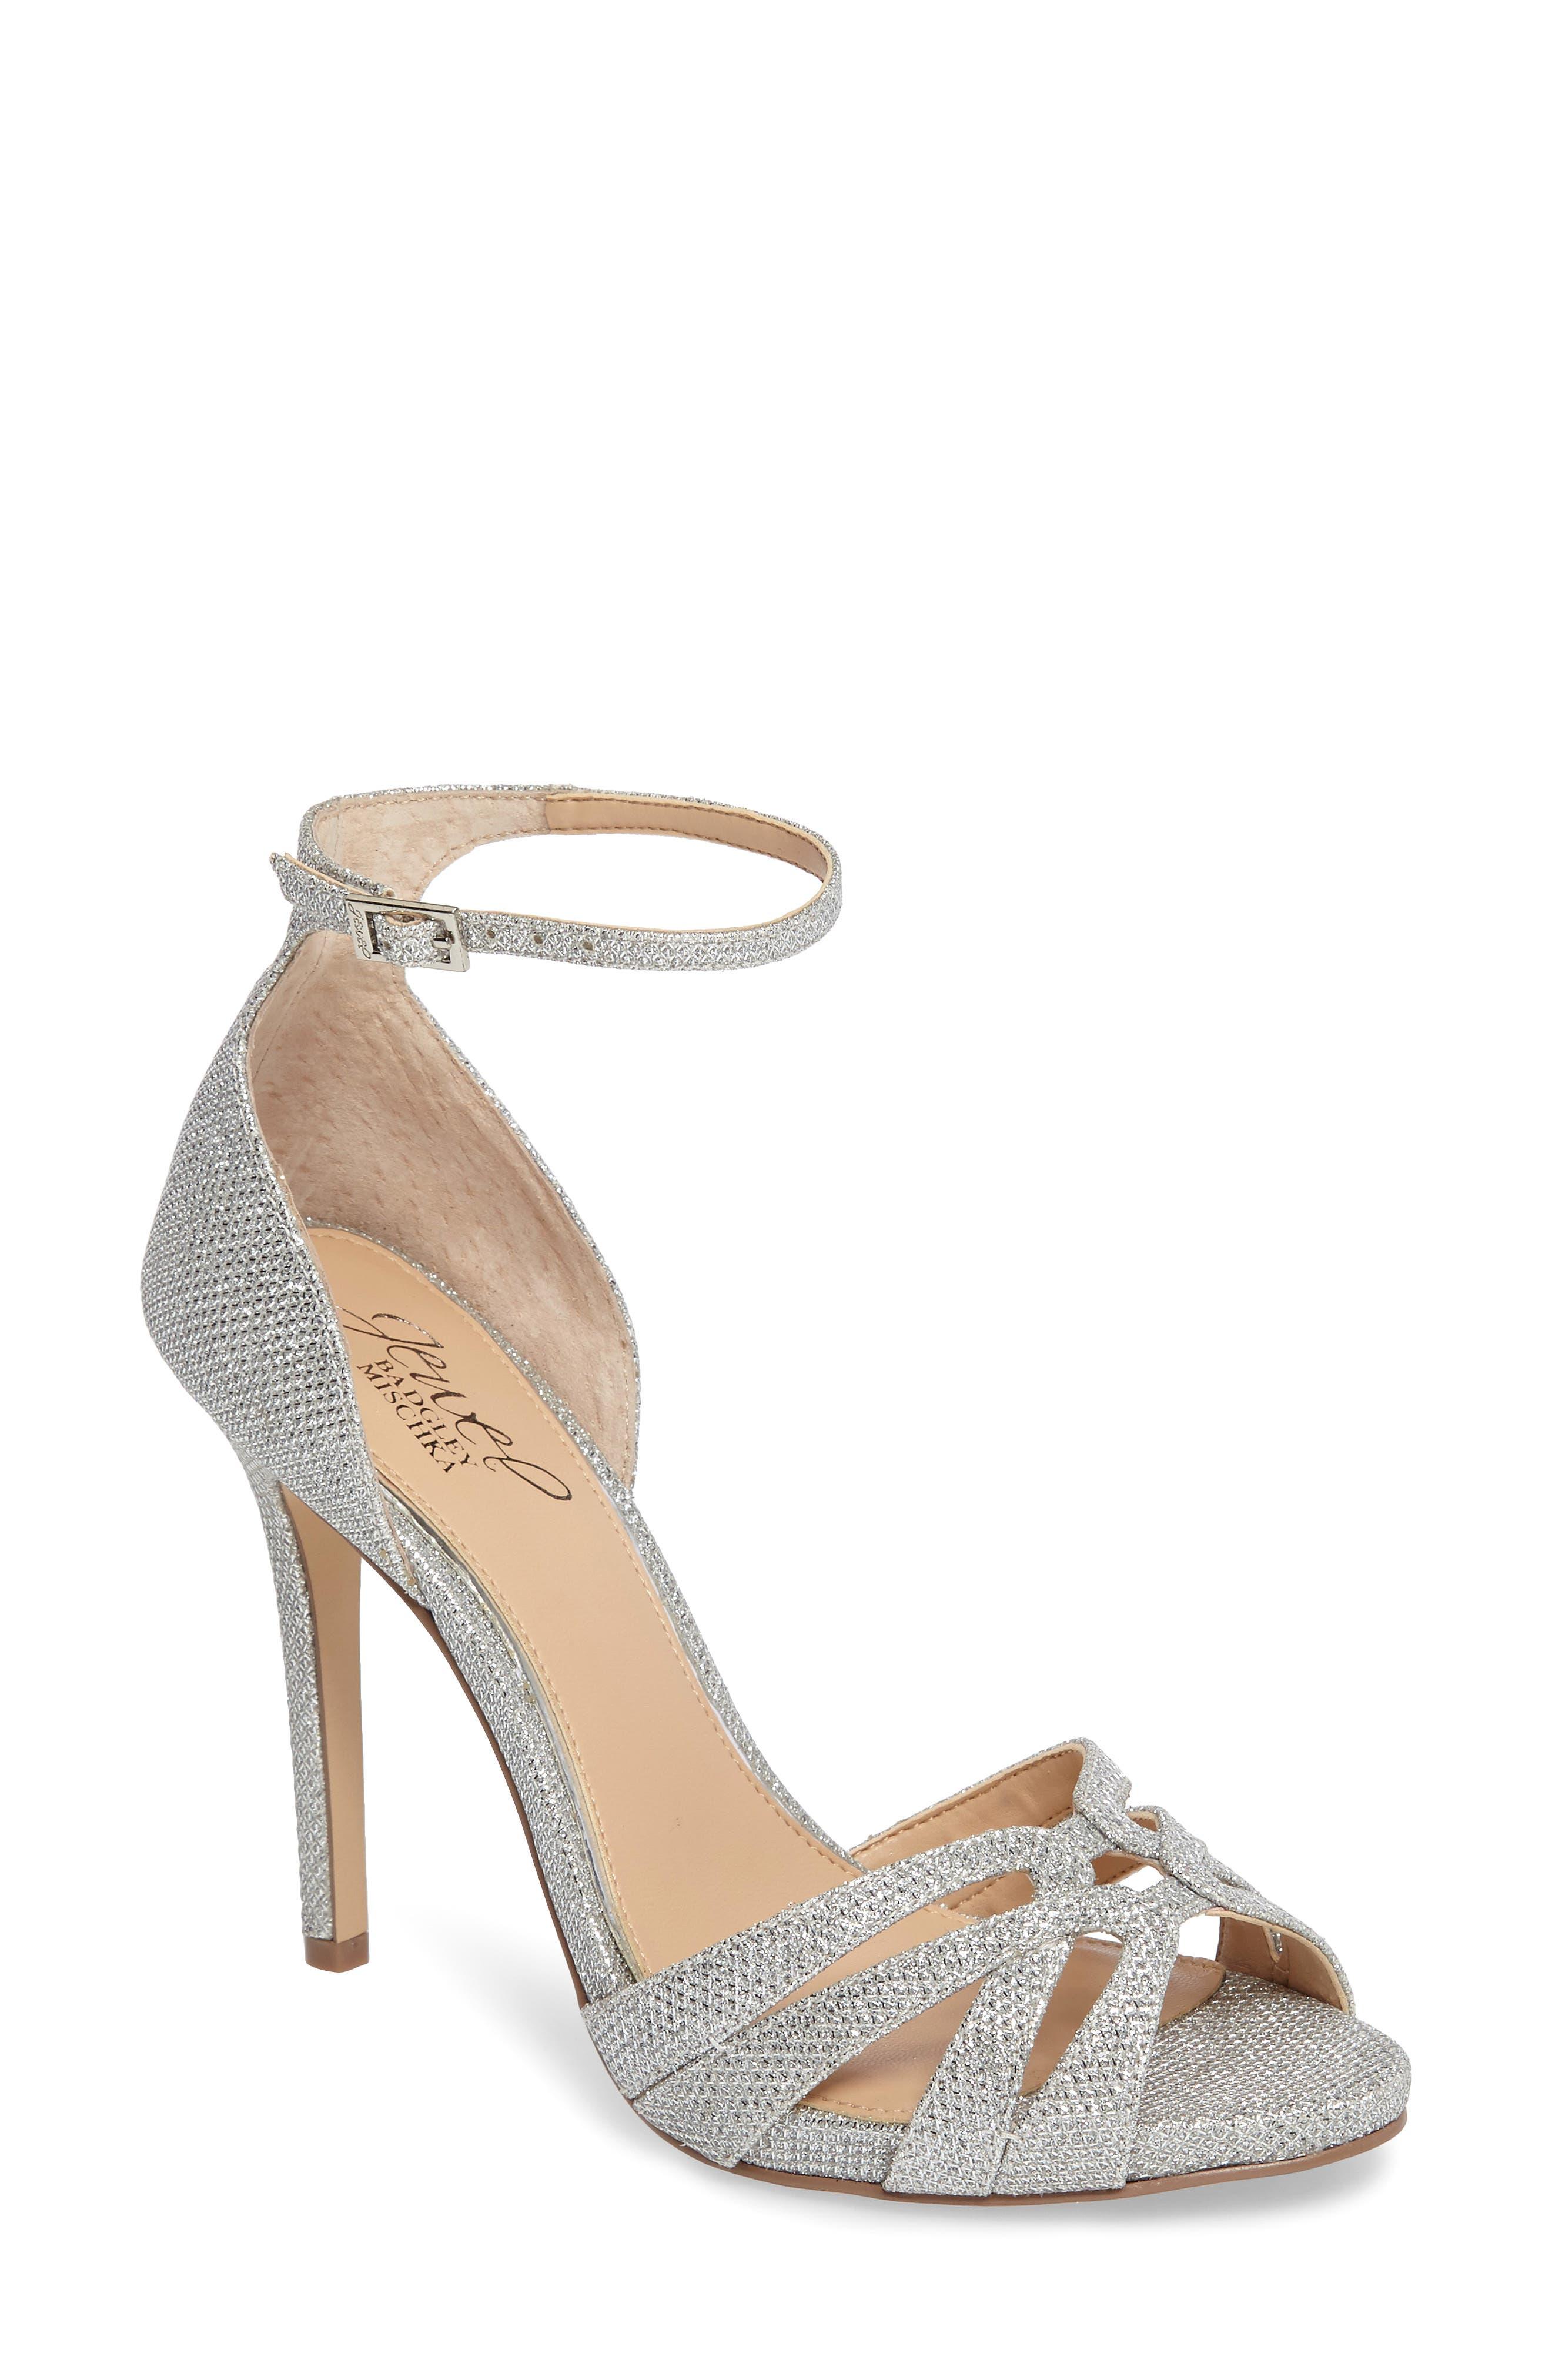 Alternate Image 1 Selected - Jewel Badgley Mischka Loyal Glitter Sandal (Women)